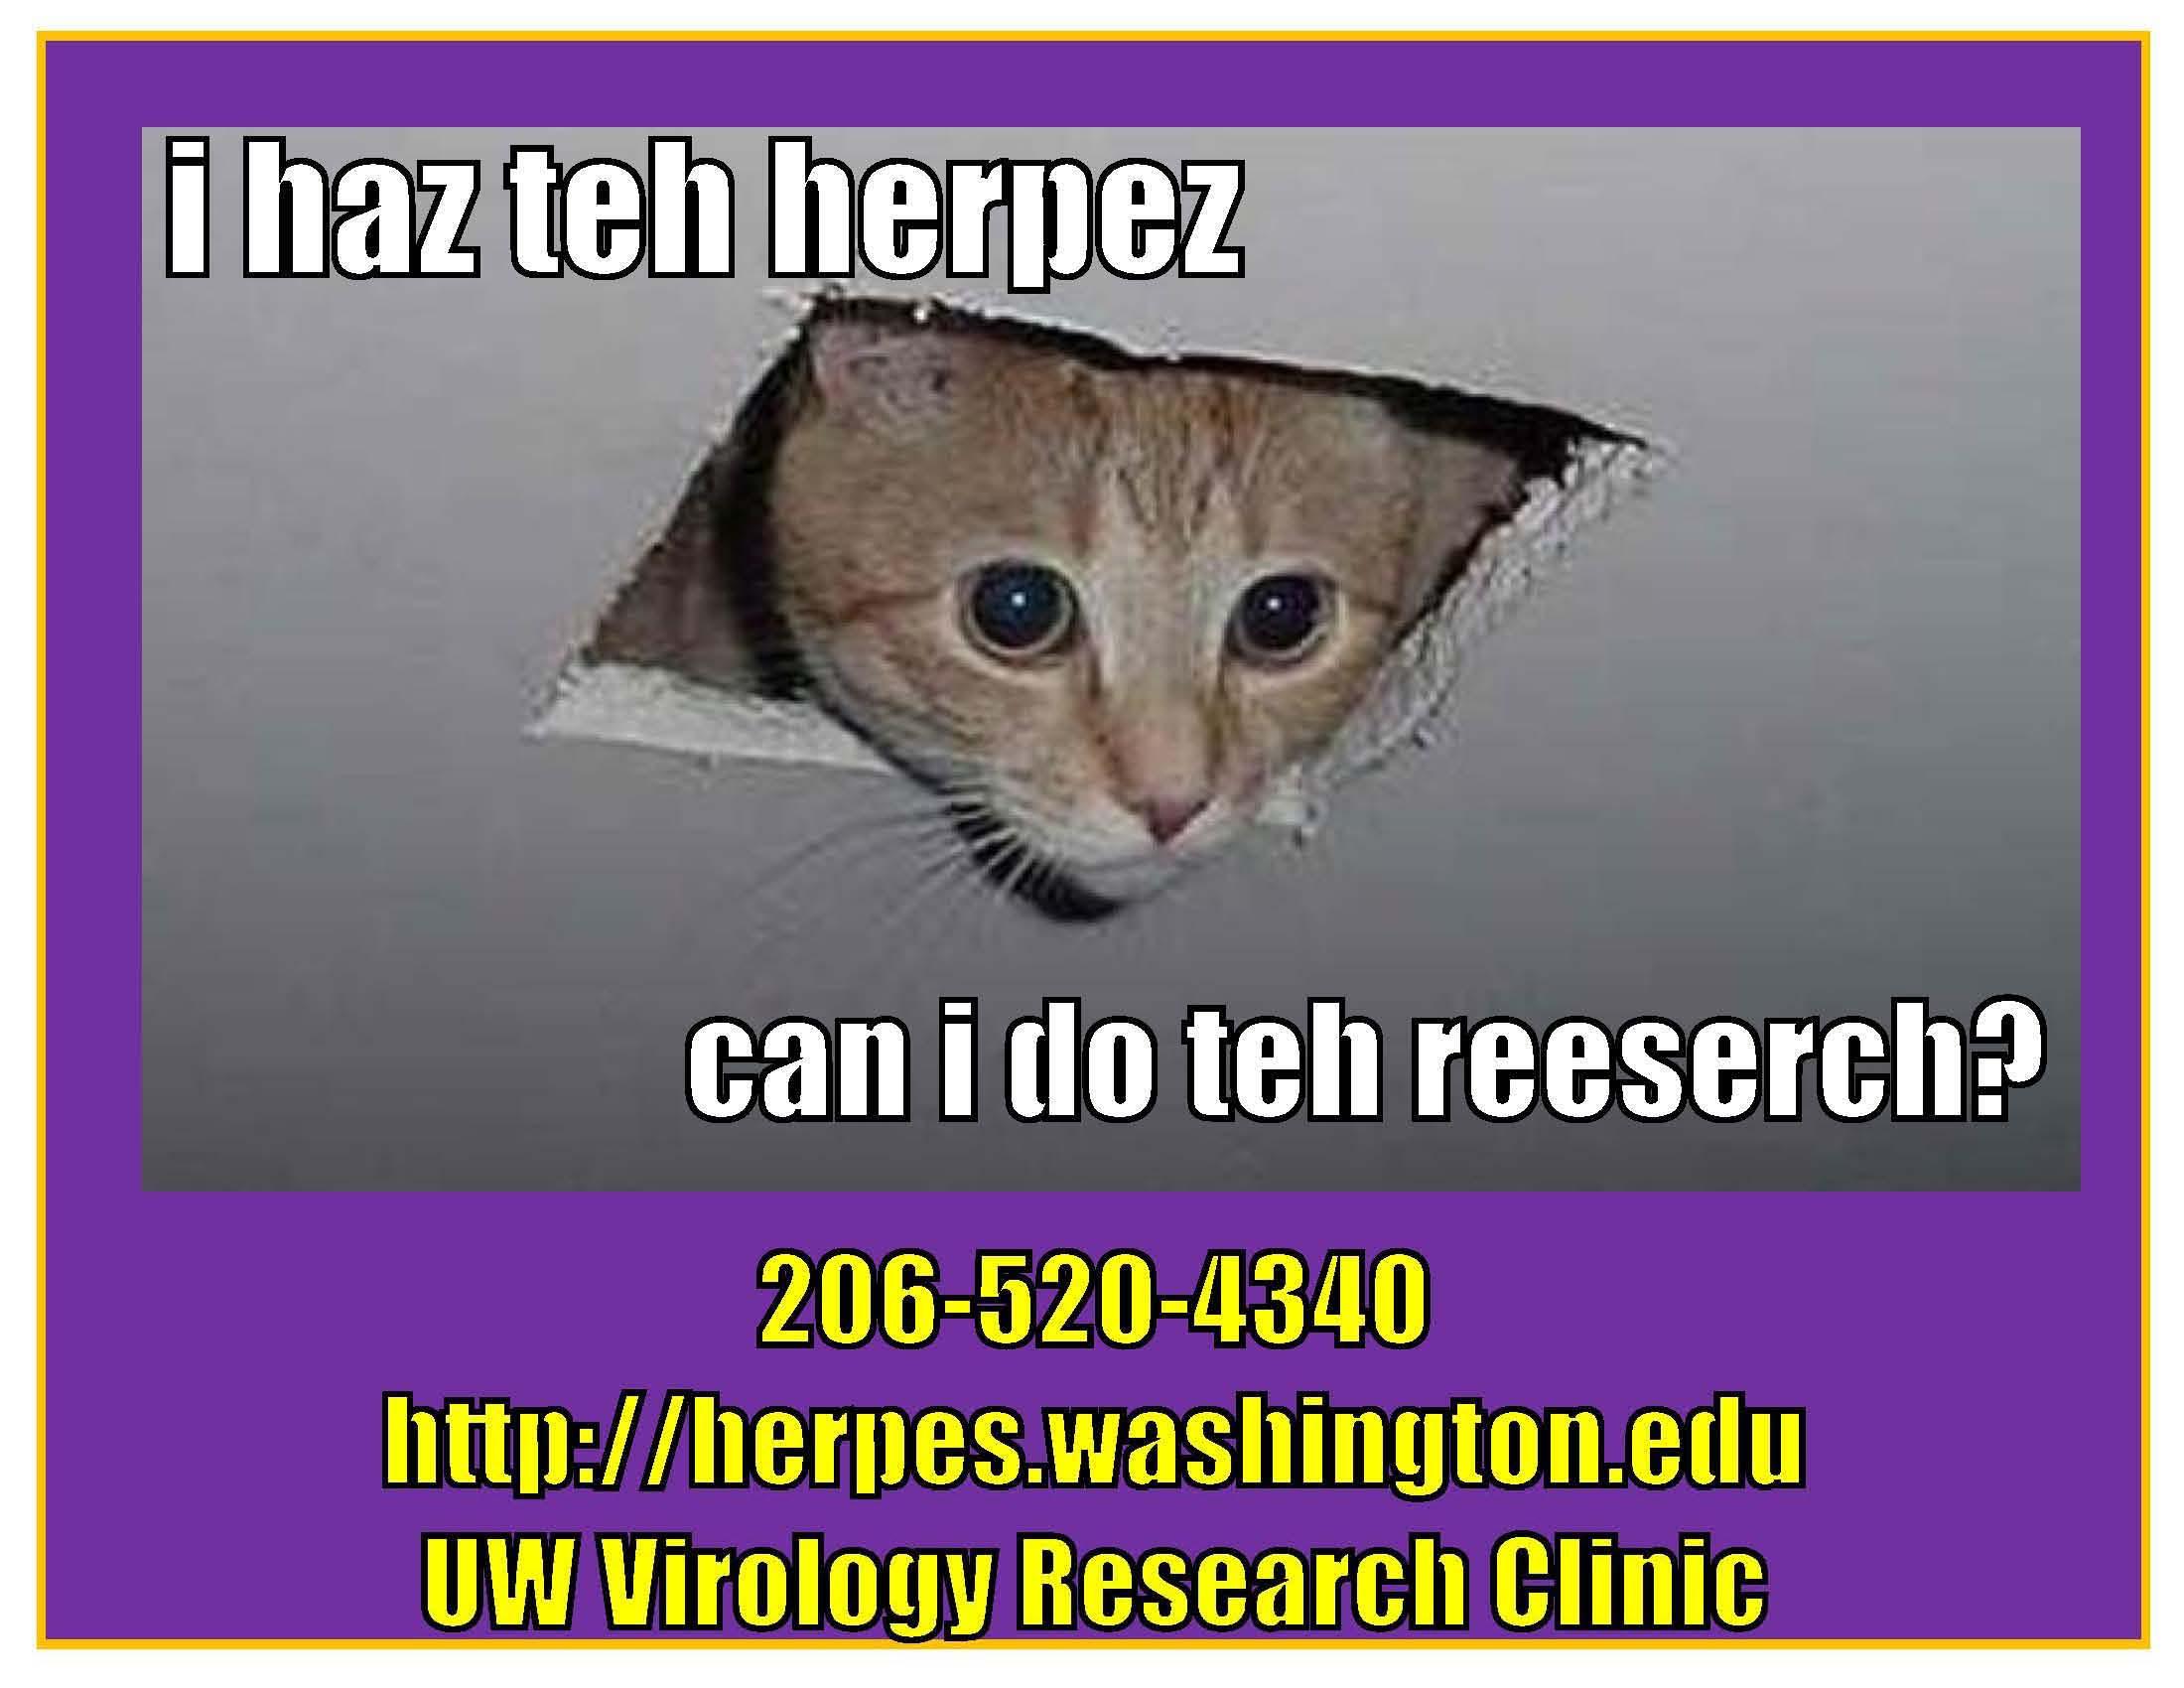 Studies - The University of Washington Virology Research Clinic